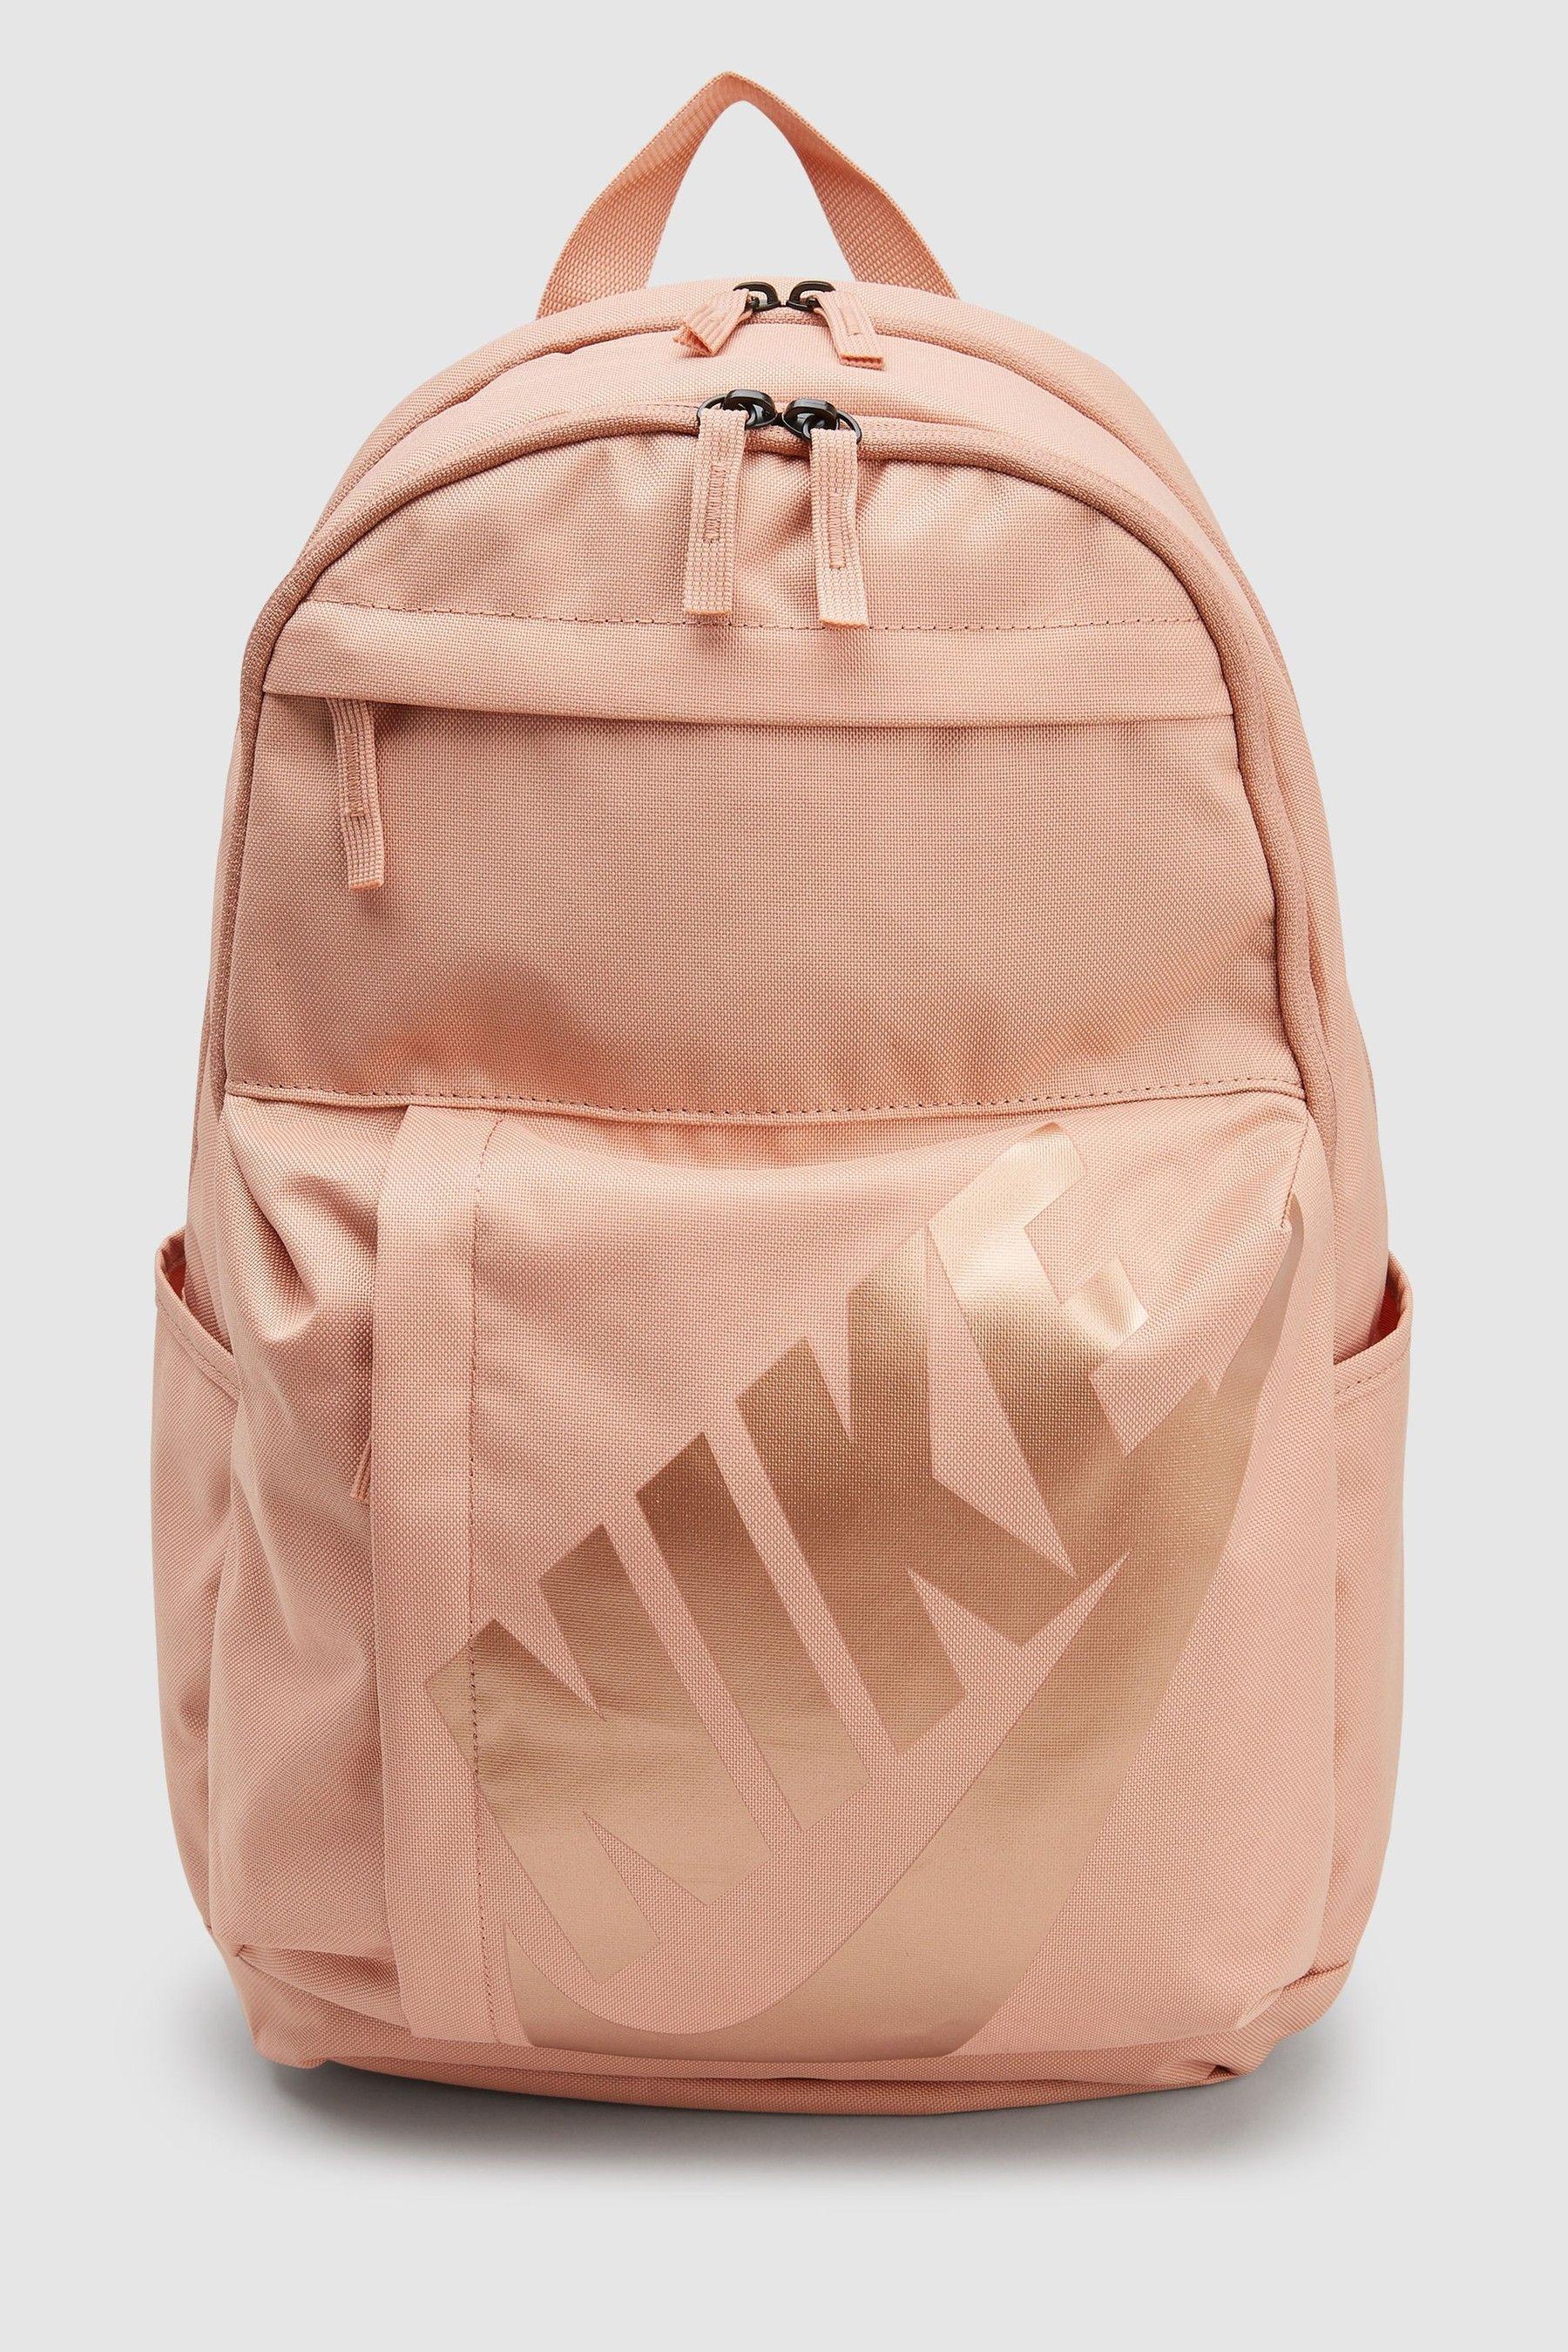 34cfdb7822556 Girls Nike Rose Gold Elemental Backpack - Gold in 2019 | bags | Gold ...